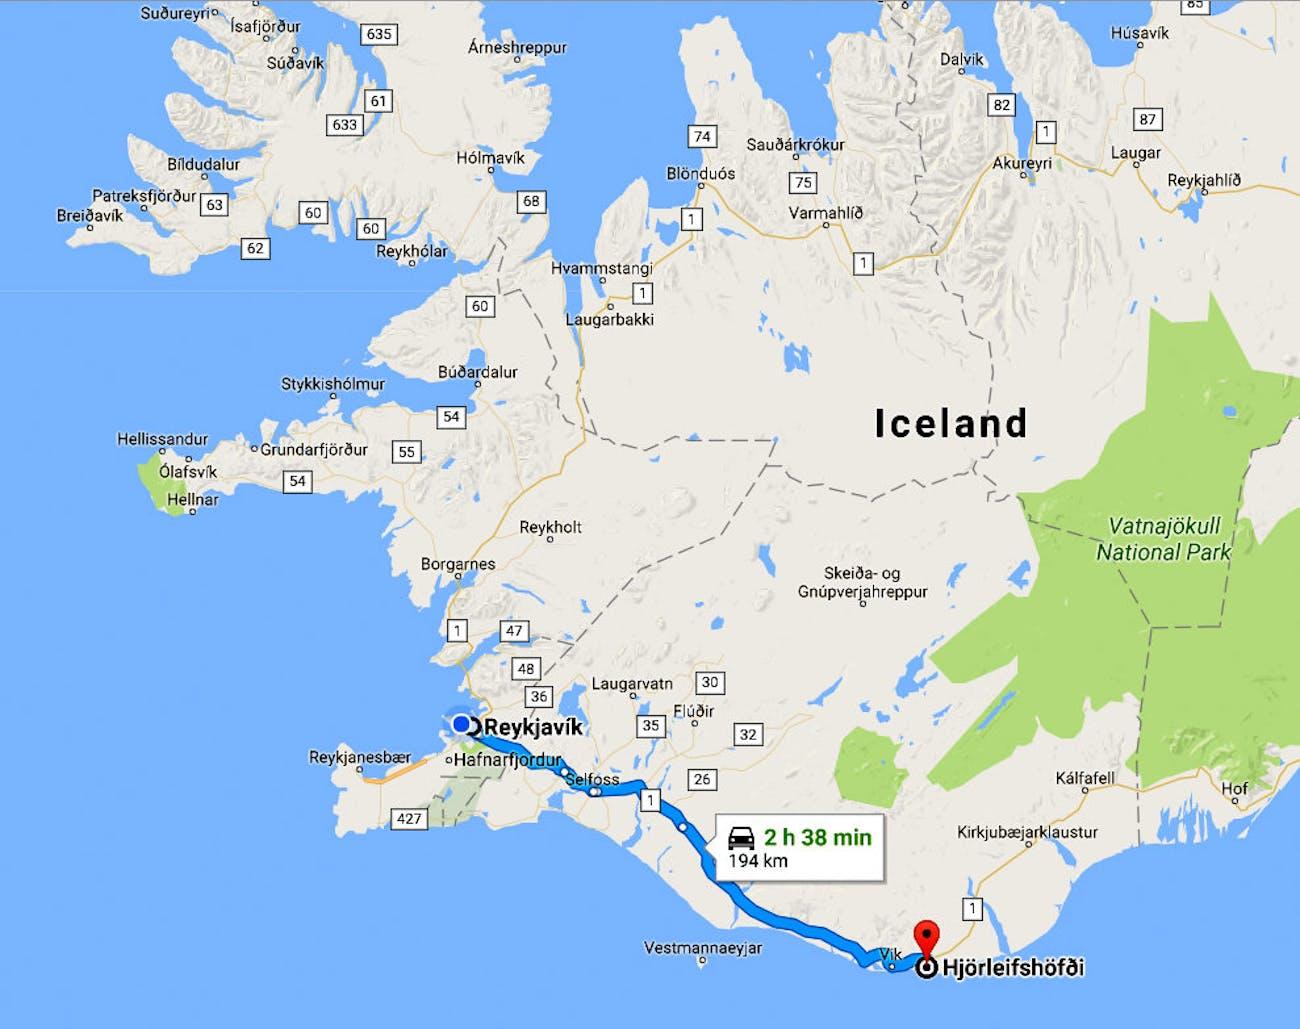 Hjörleifshöfði in South-Iceland - Part II - the Hike, the